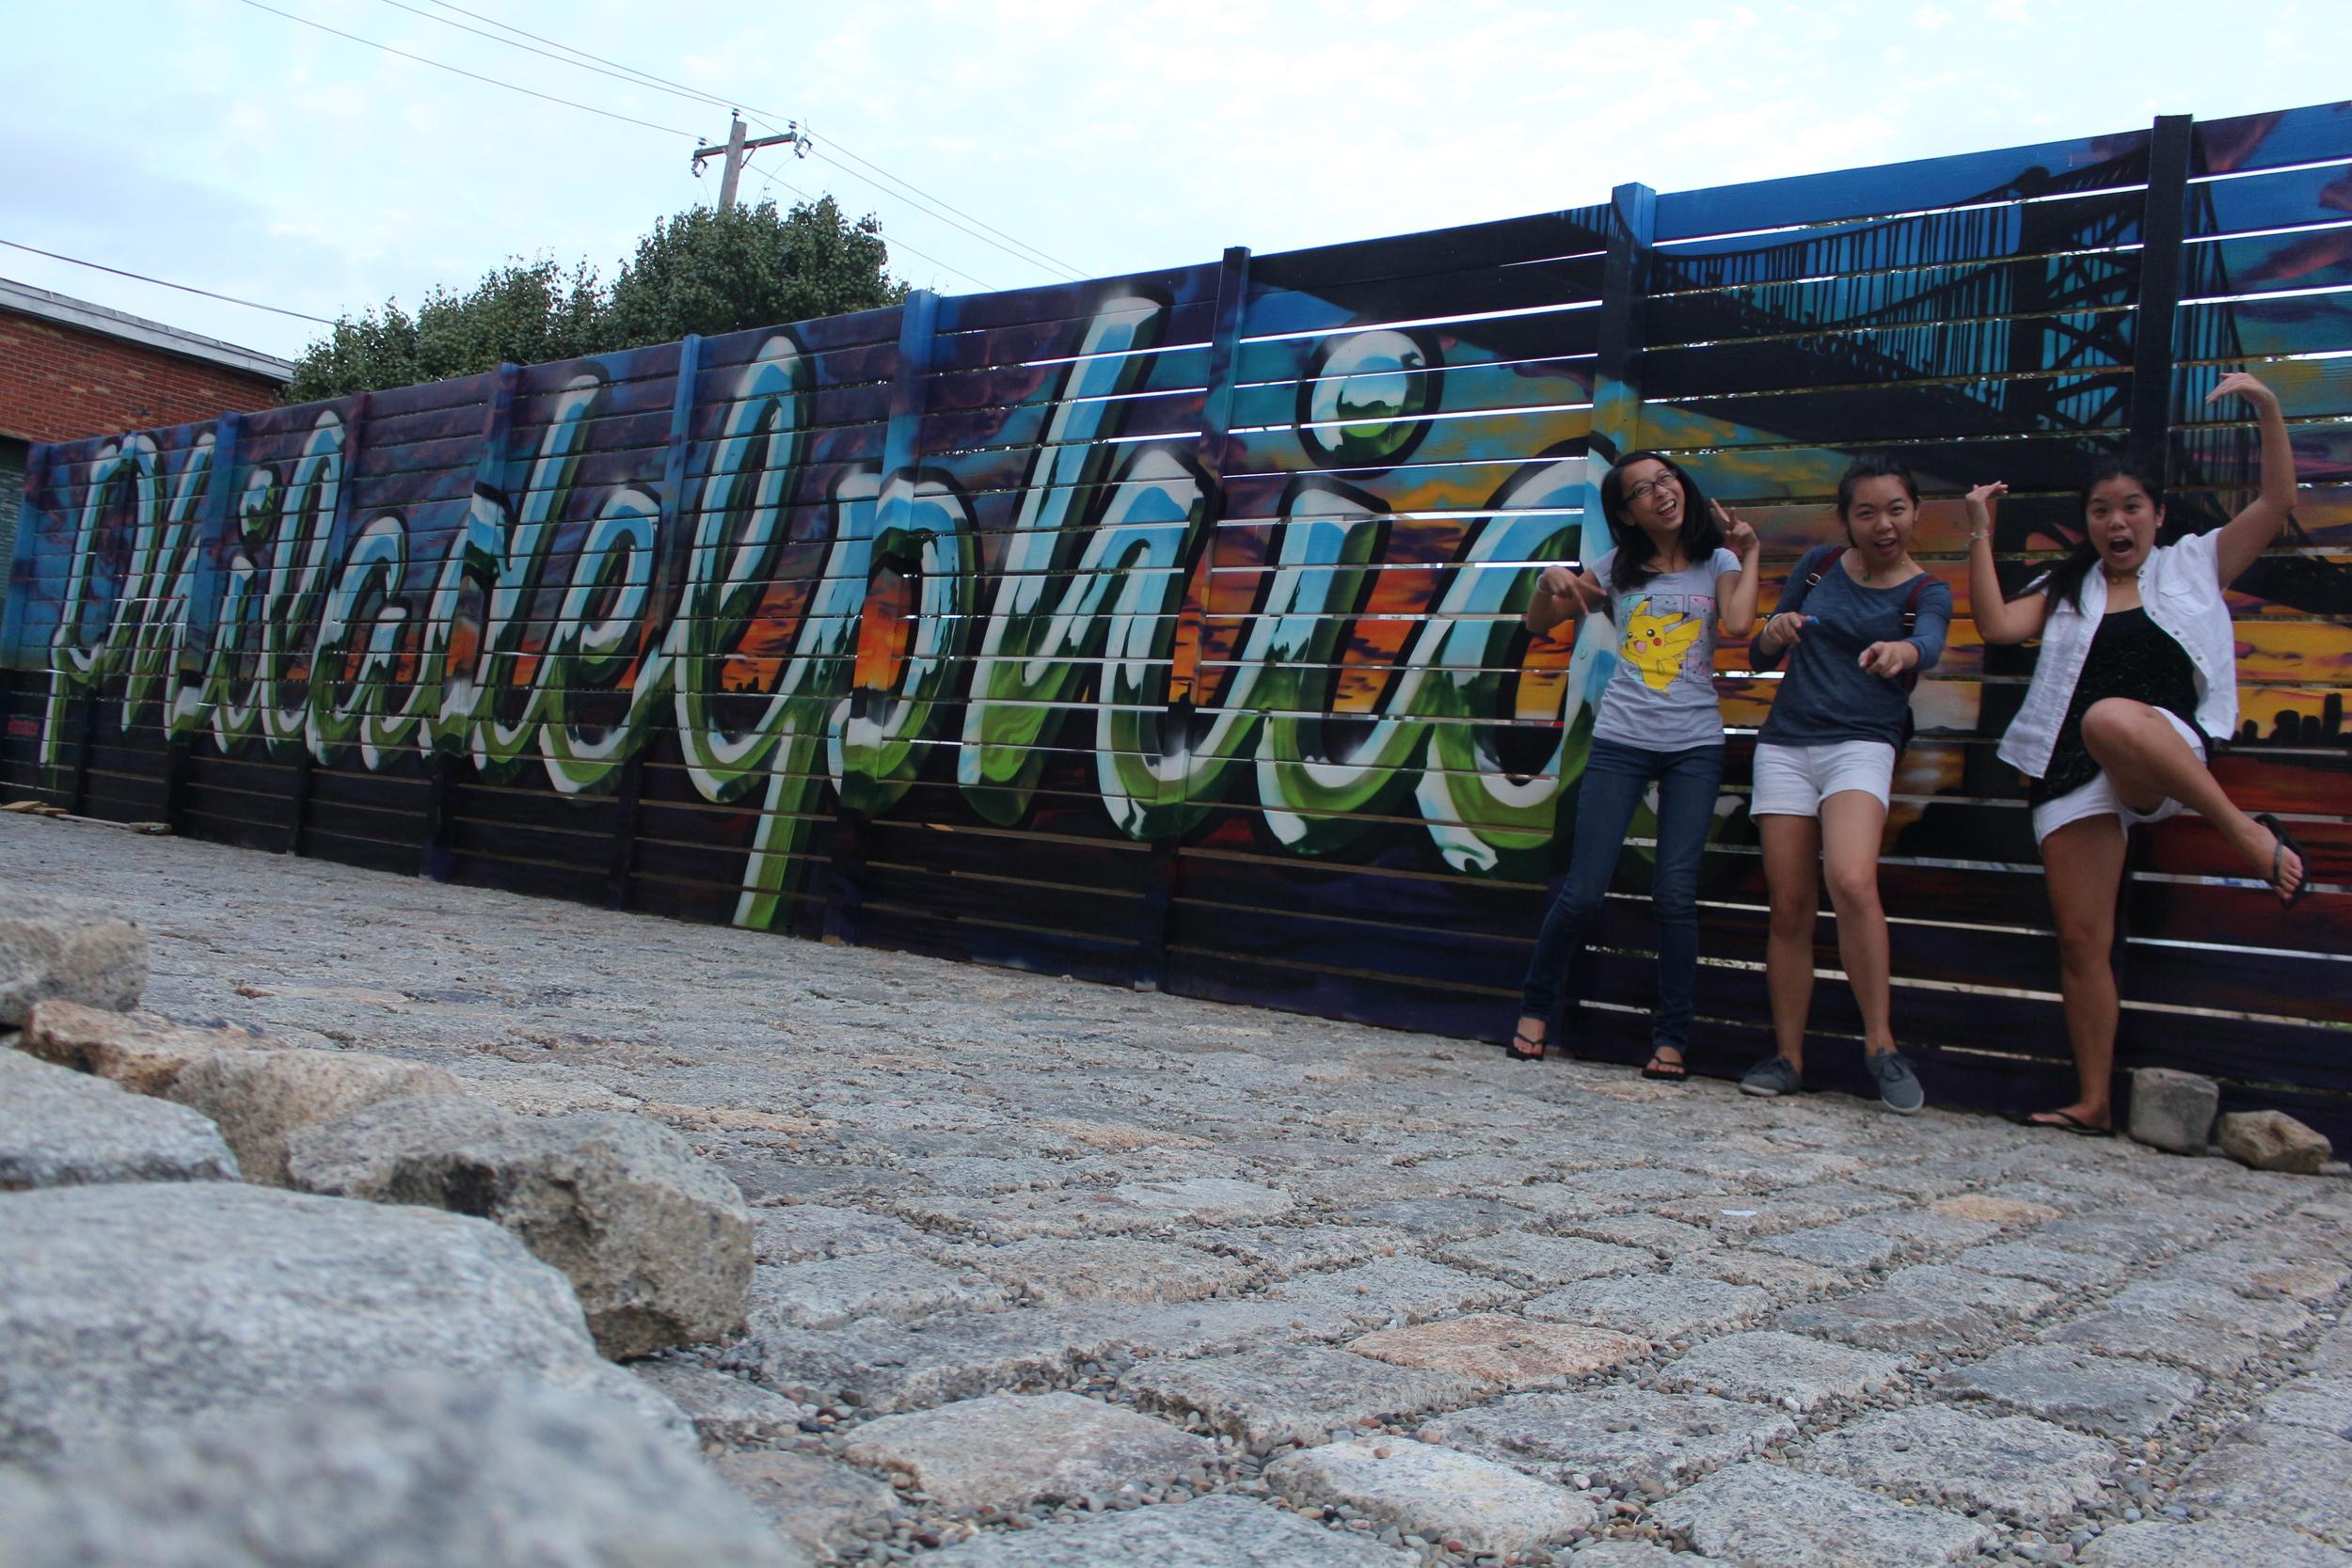 Graffiti done by @glossblack